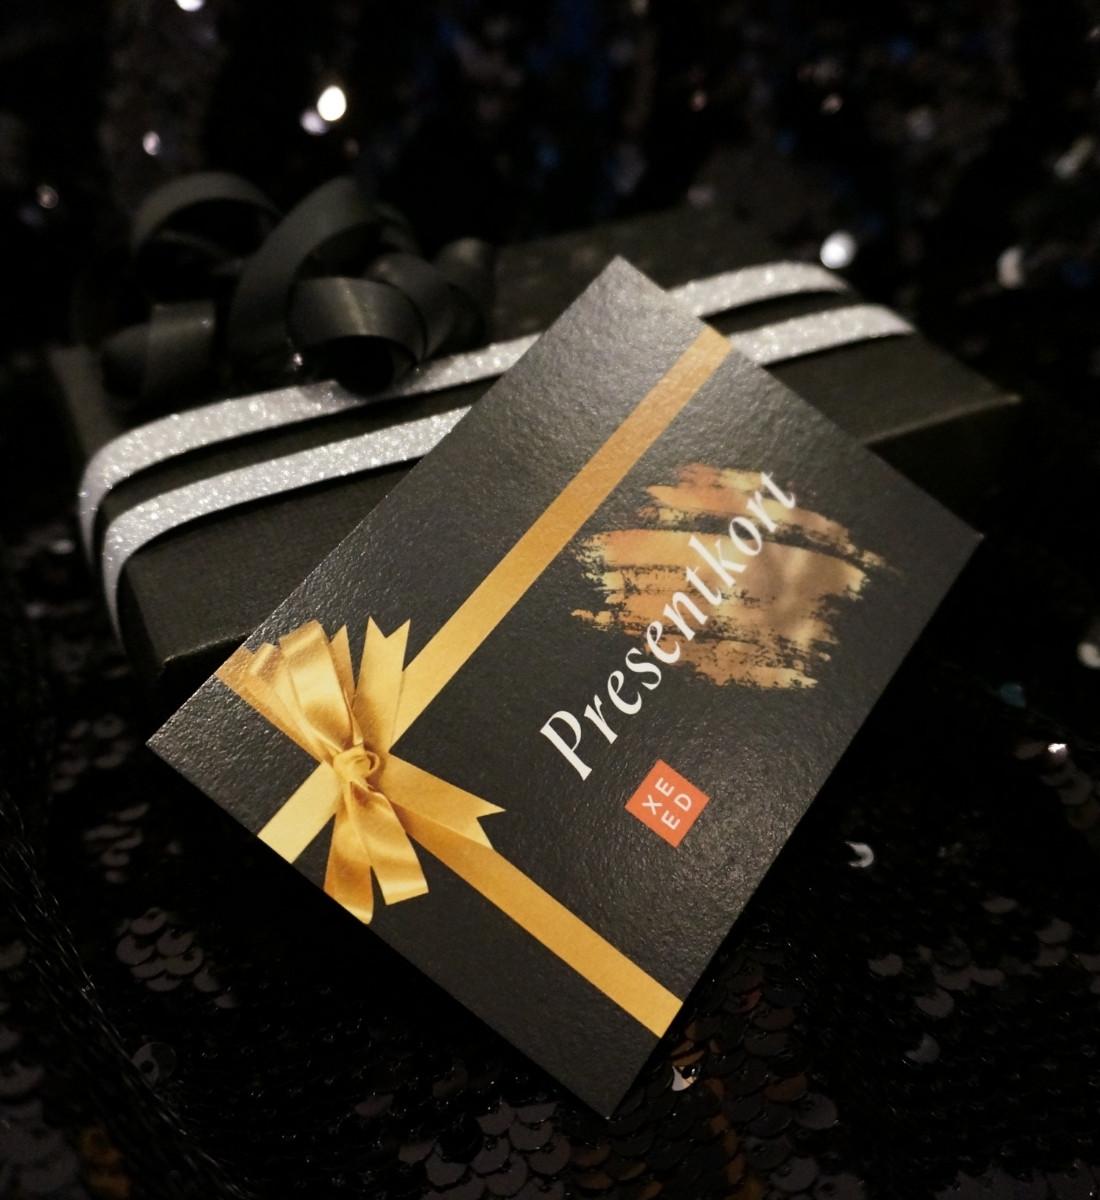 Inslaget presentkorts I box Xeed